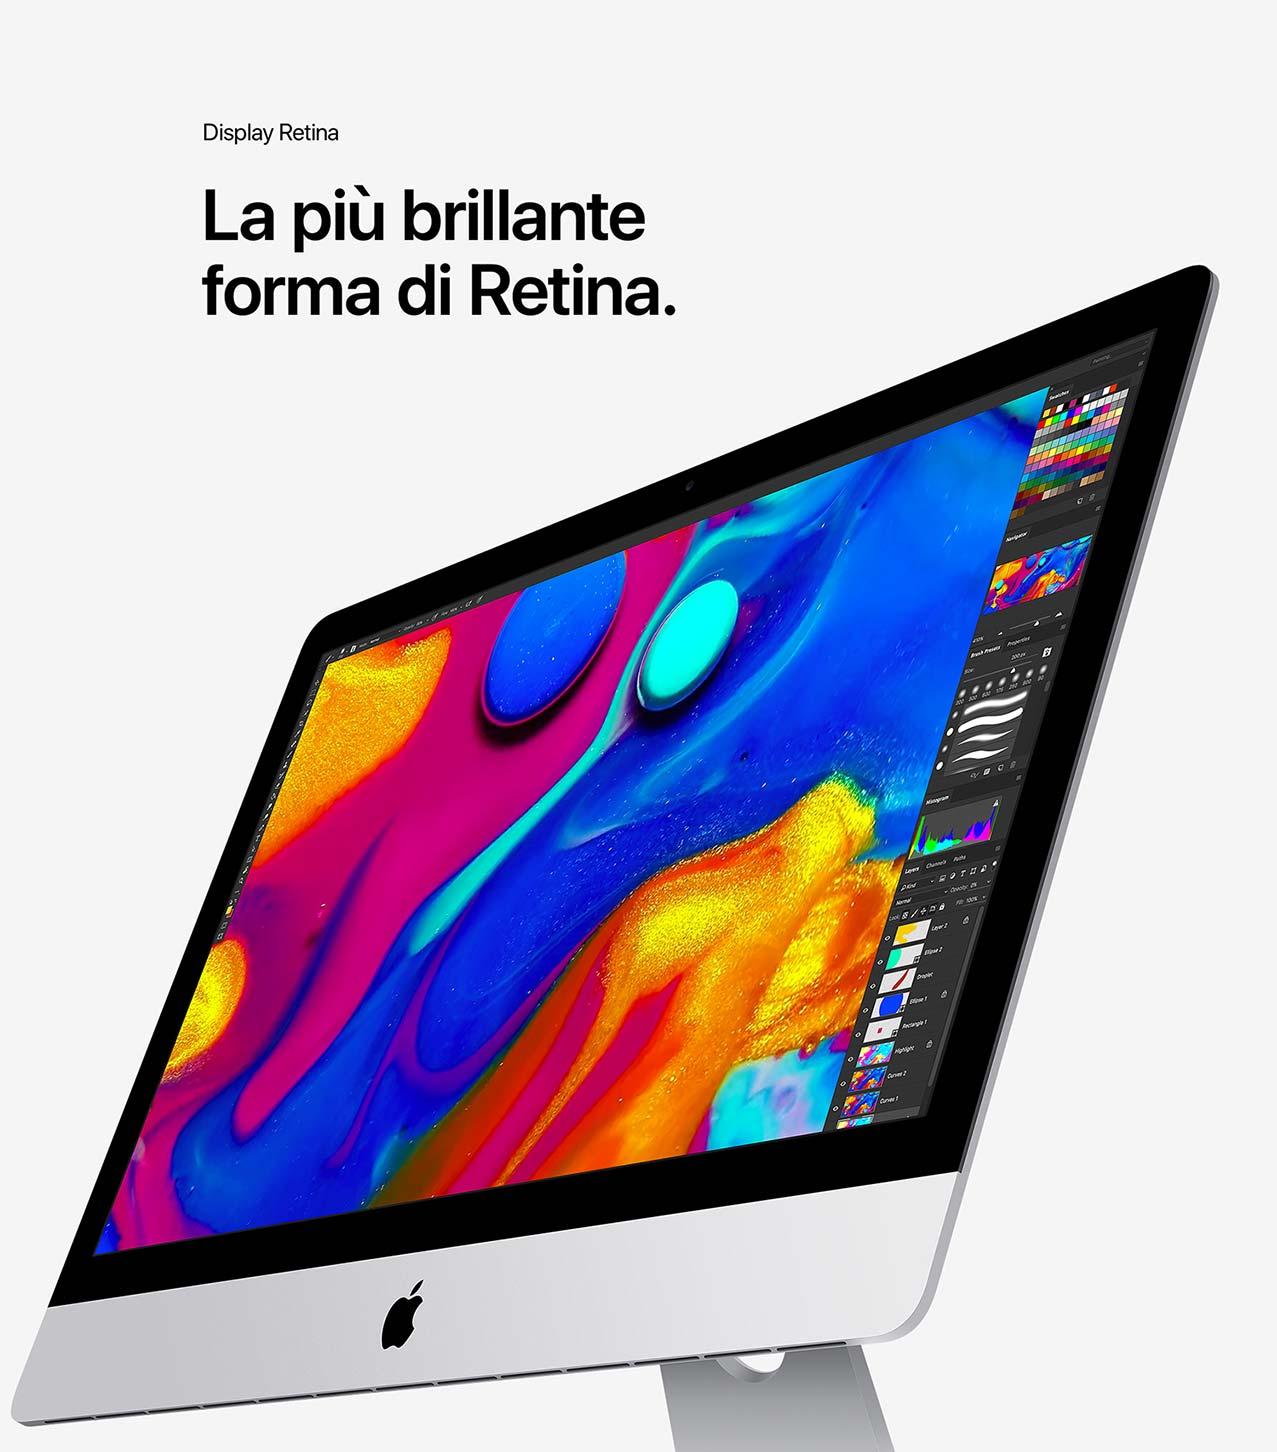 iMac display retina